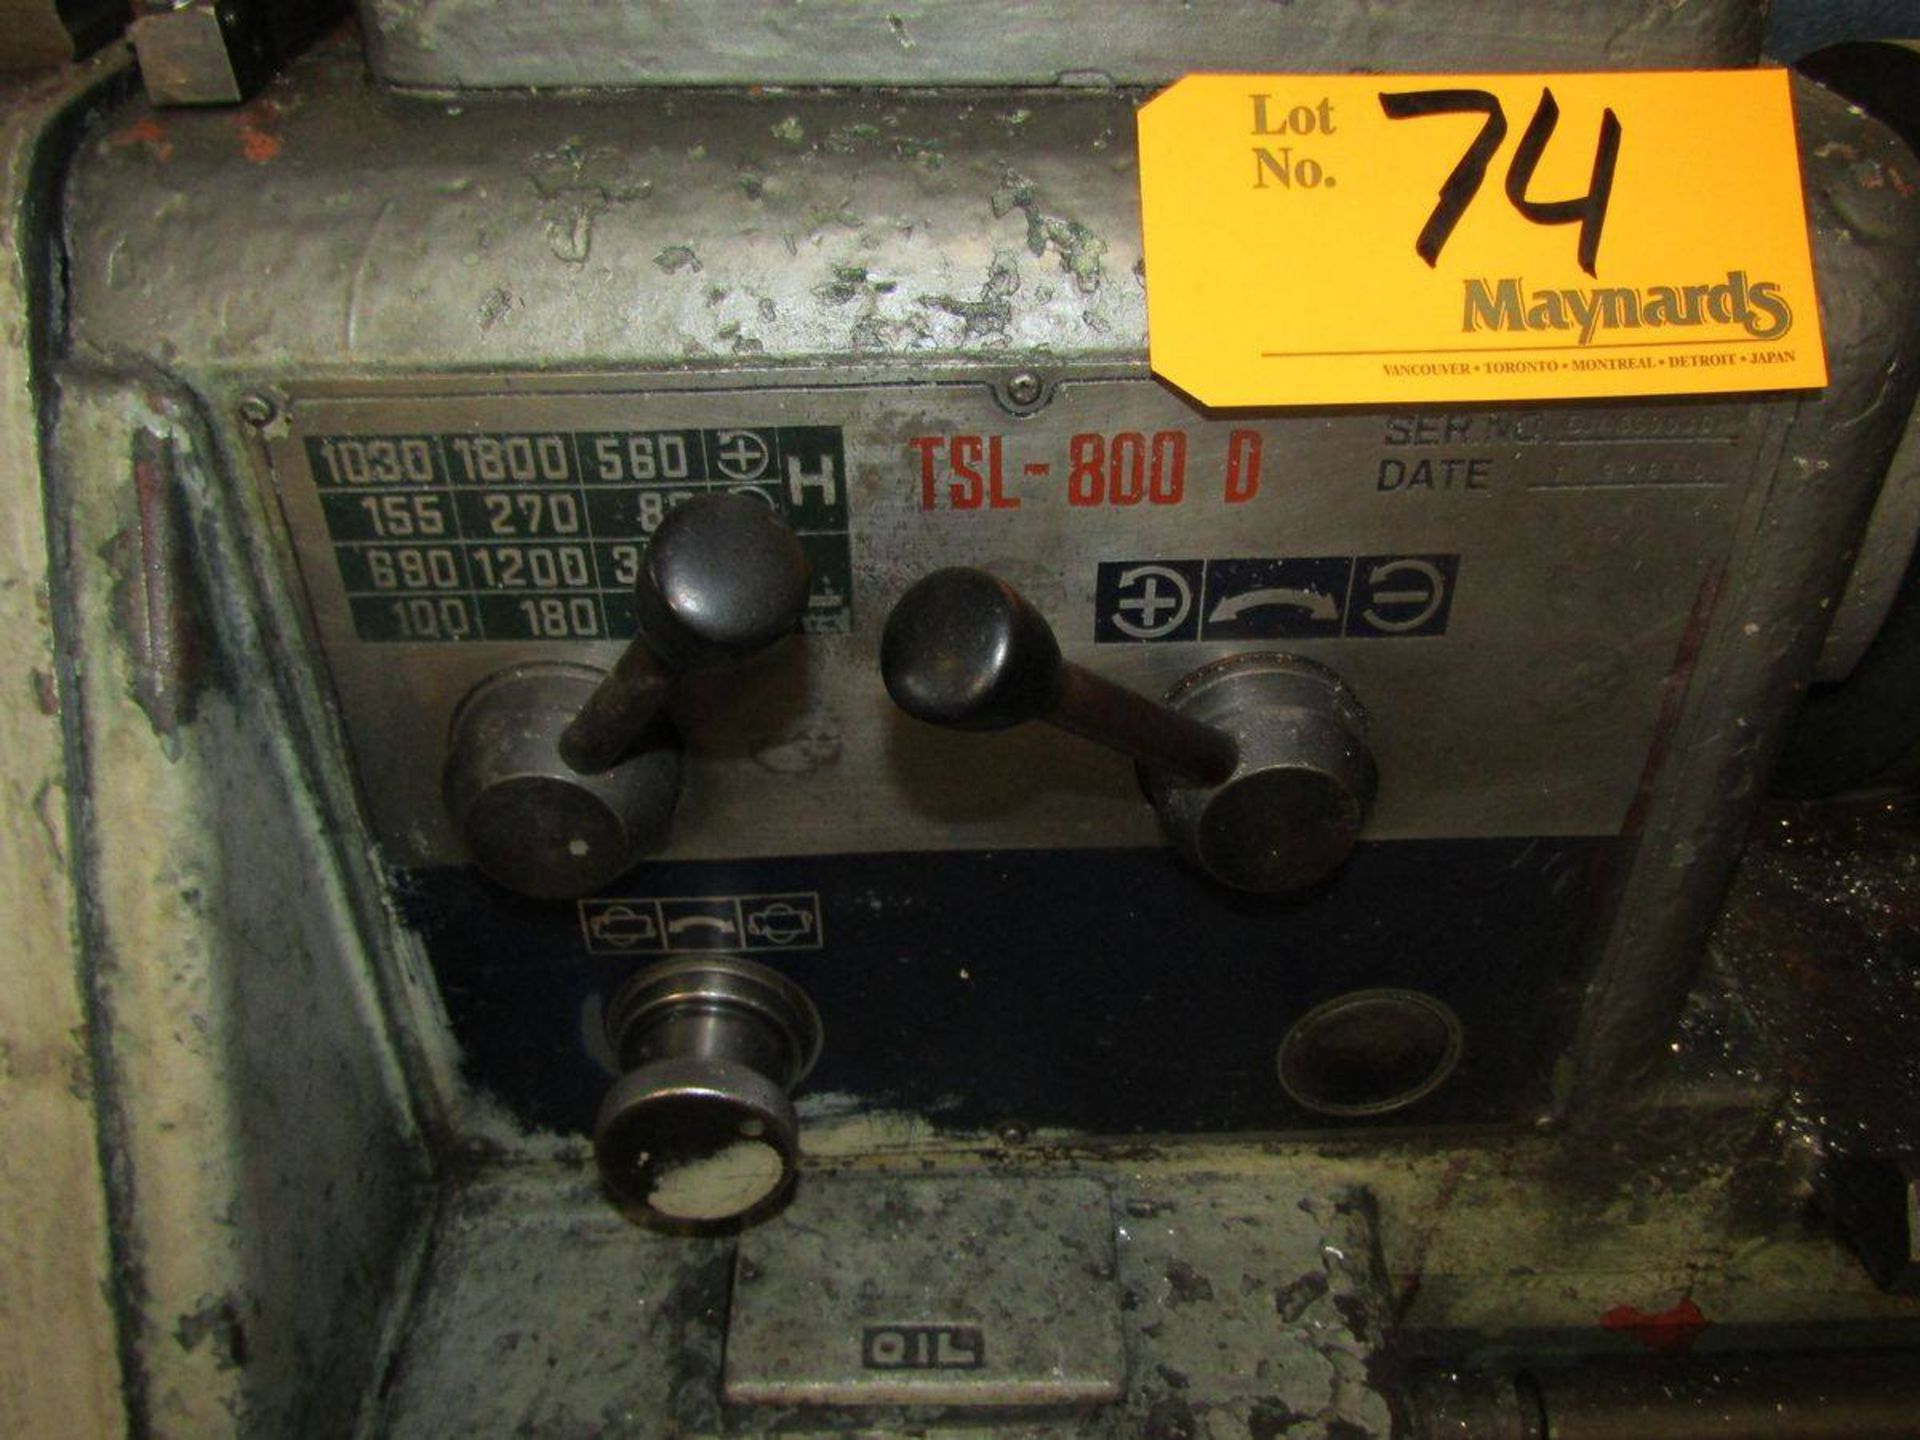 Lot 74 - 1980 Royal TSL-800D Engine Lathe